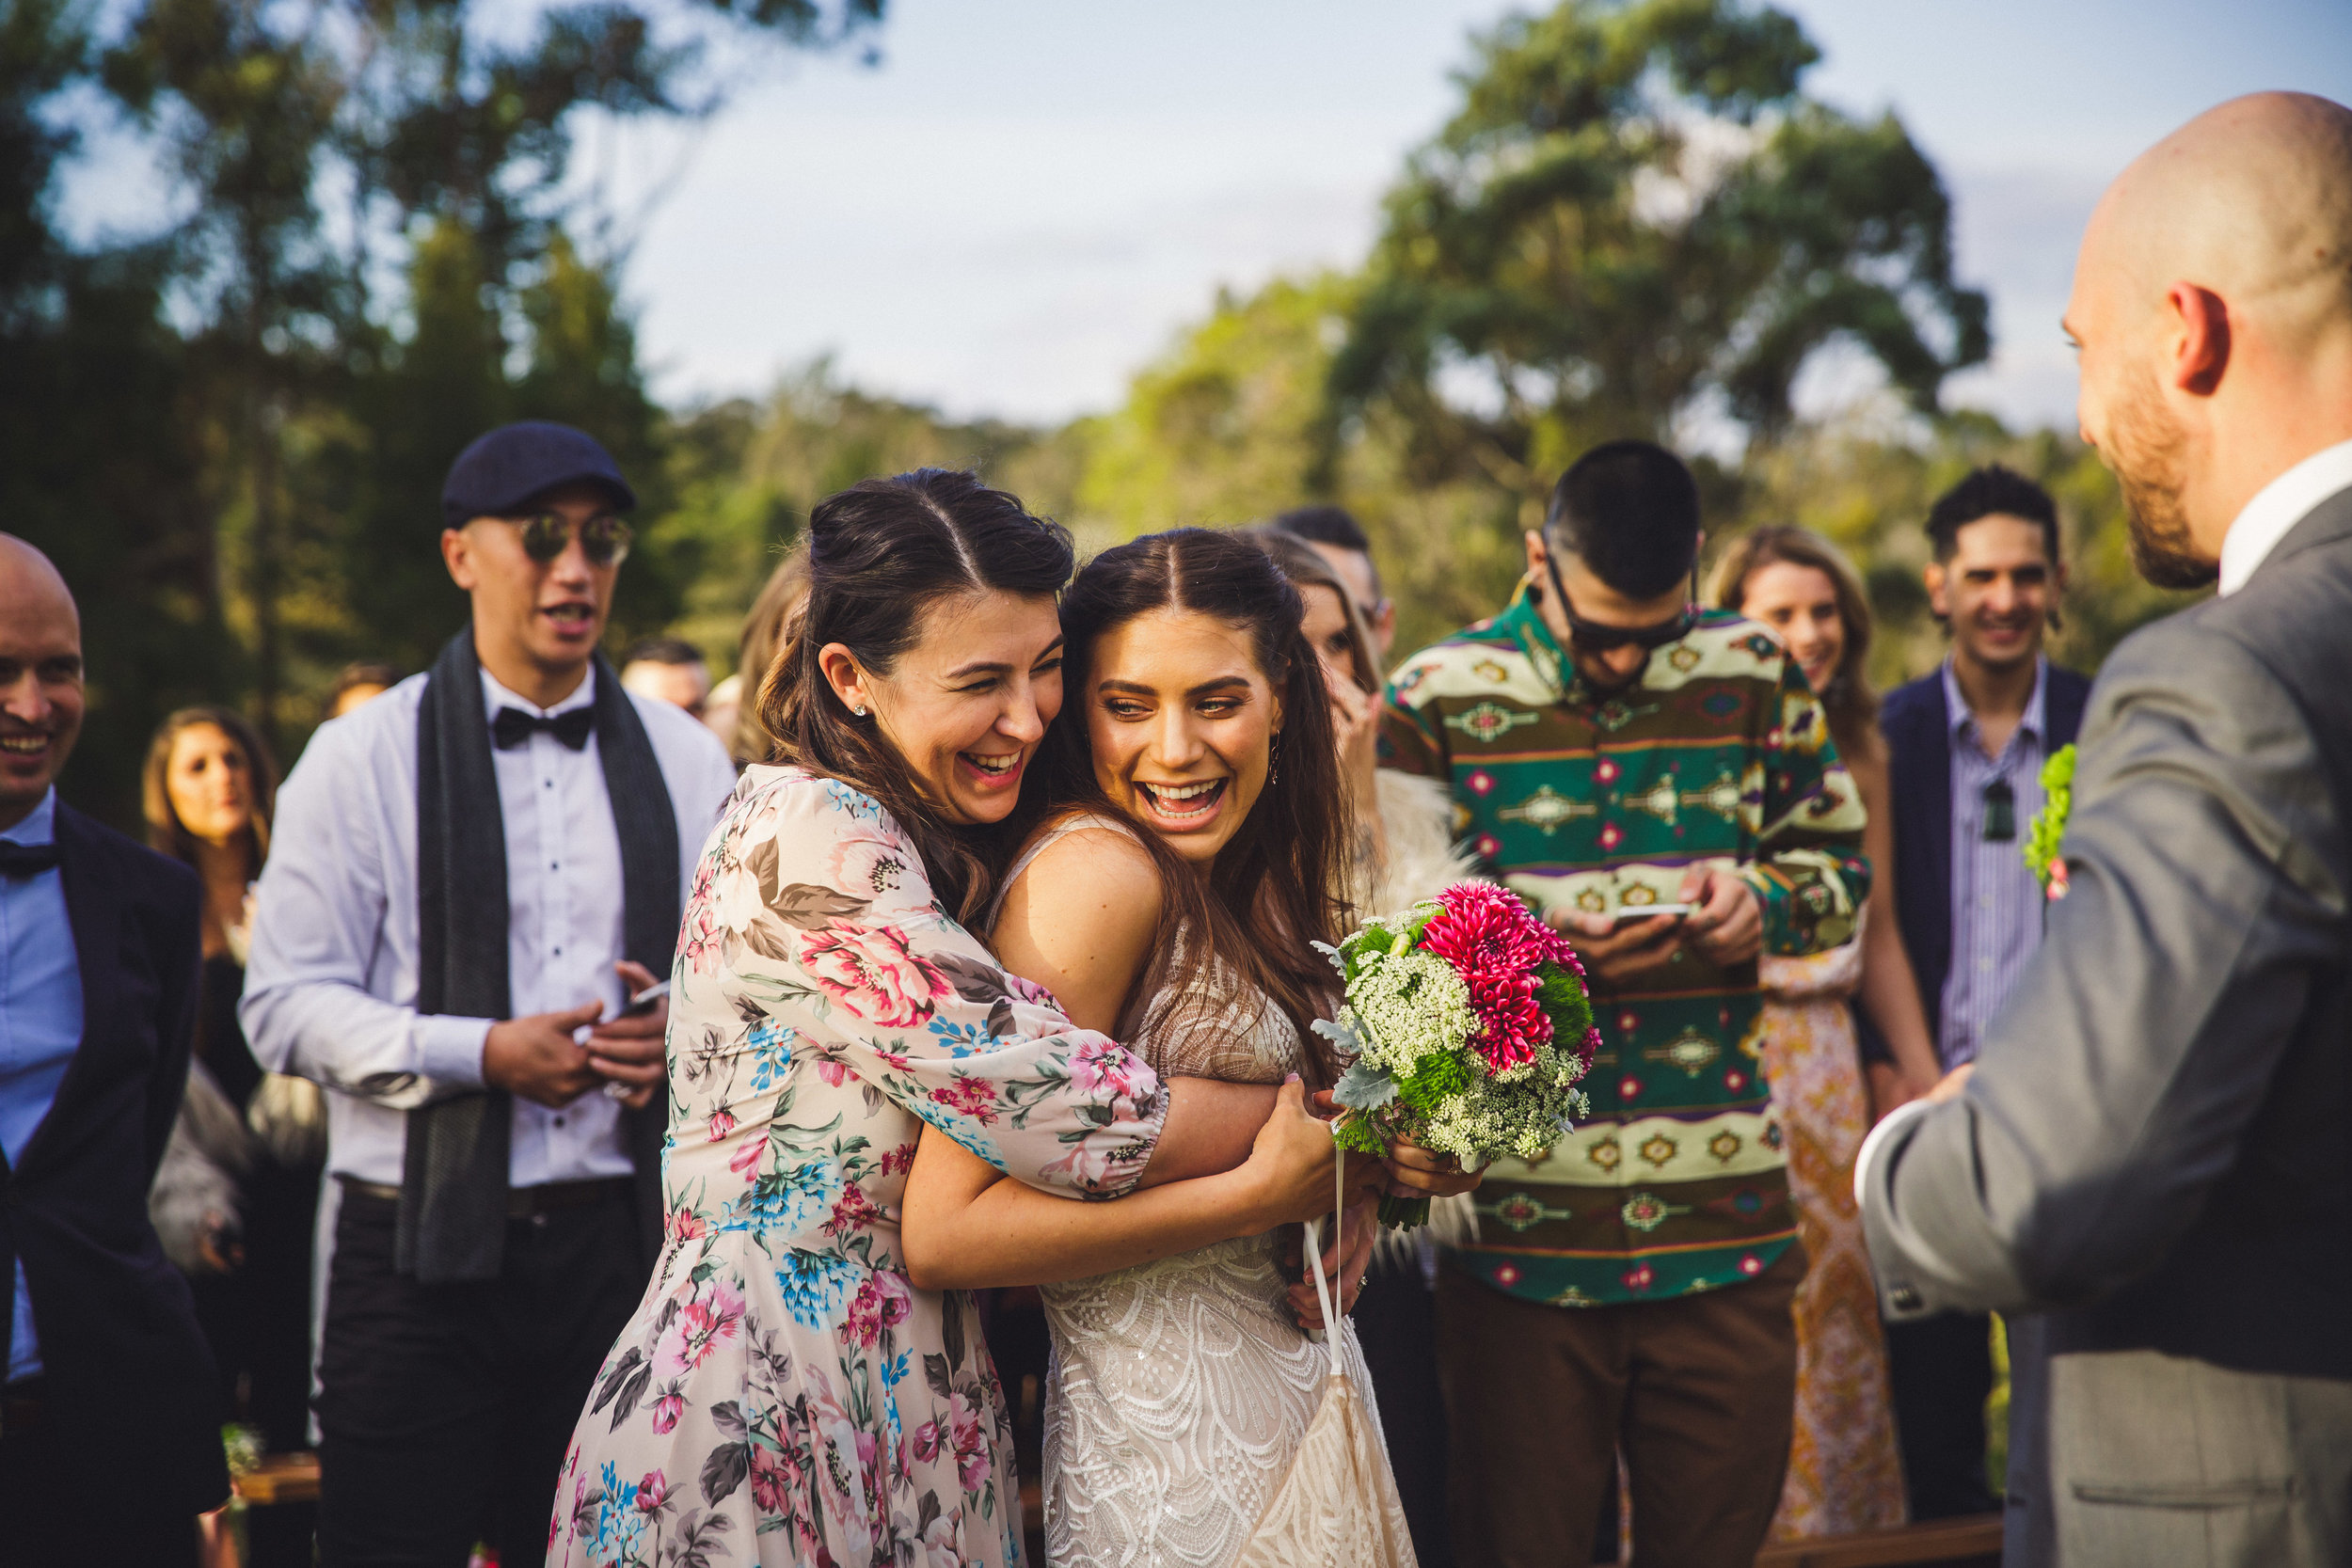 oceanview-estsates-wedding-photo-2.JPG